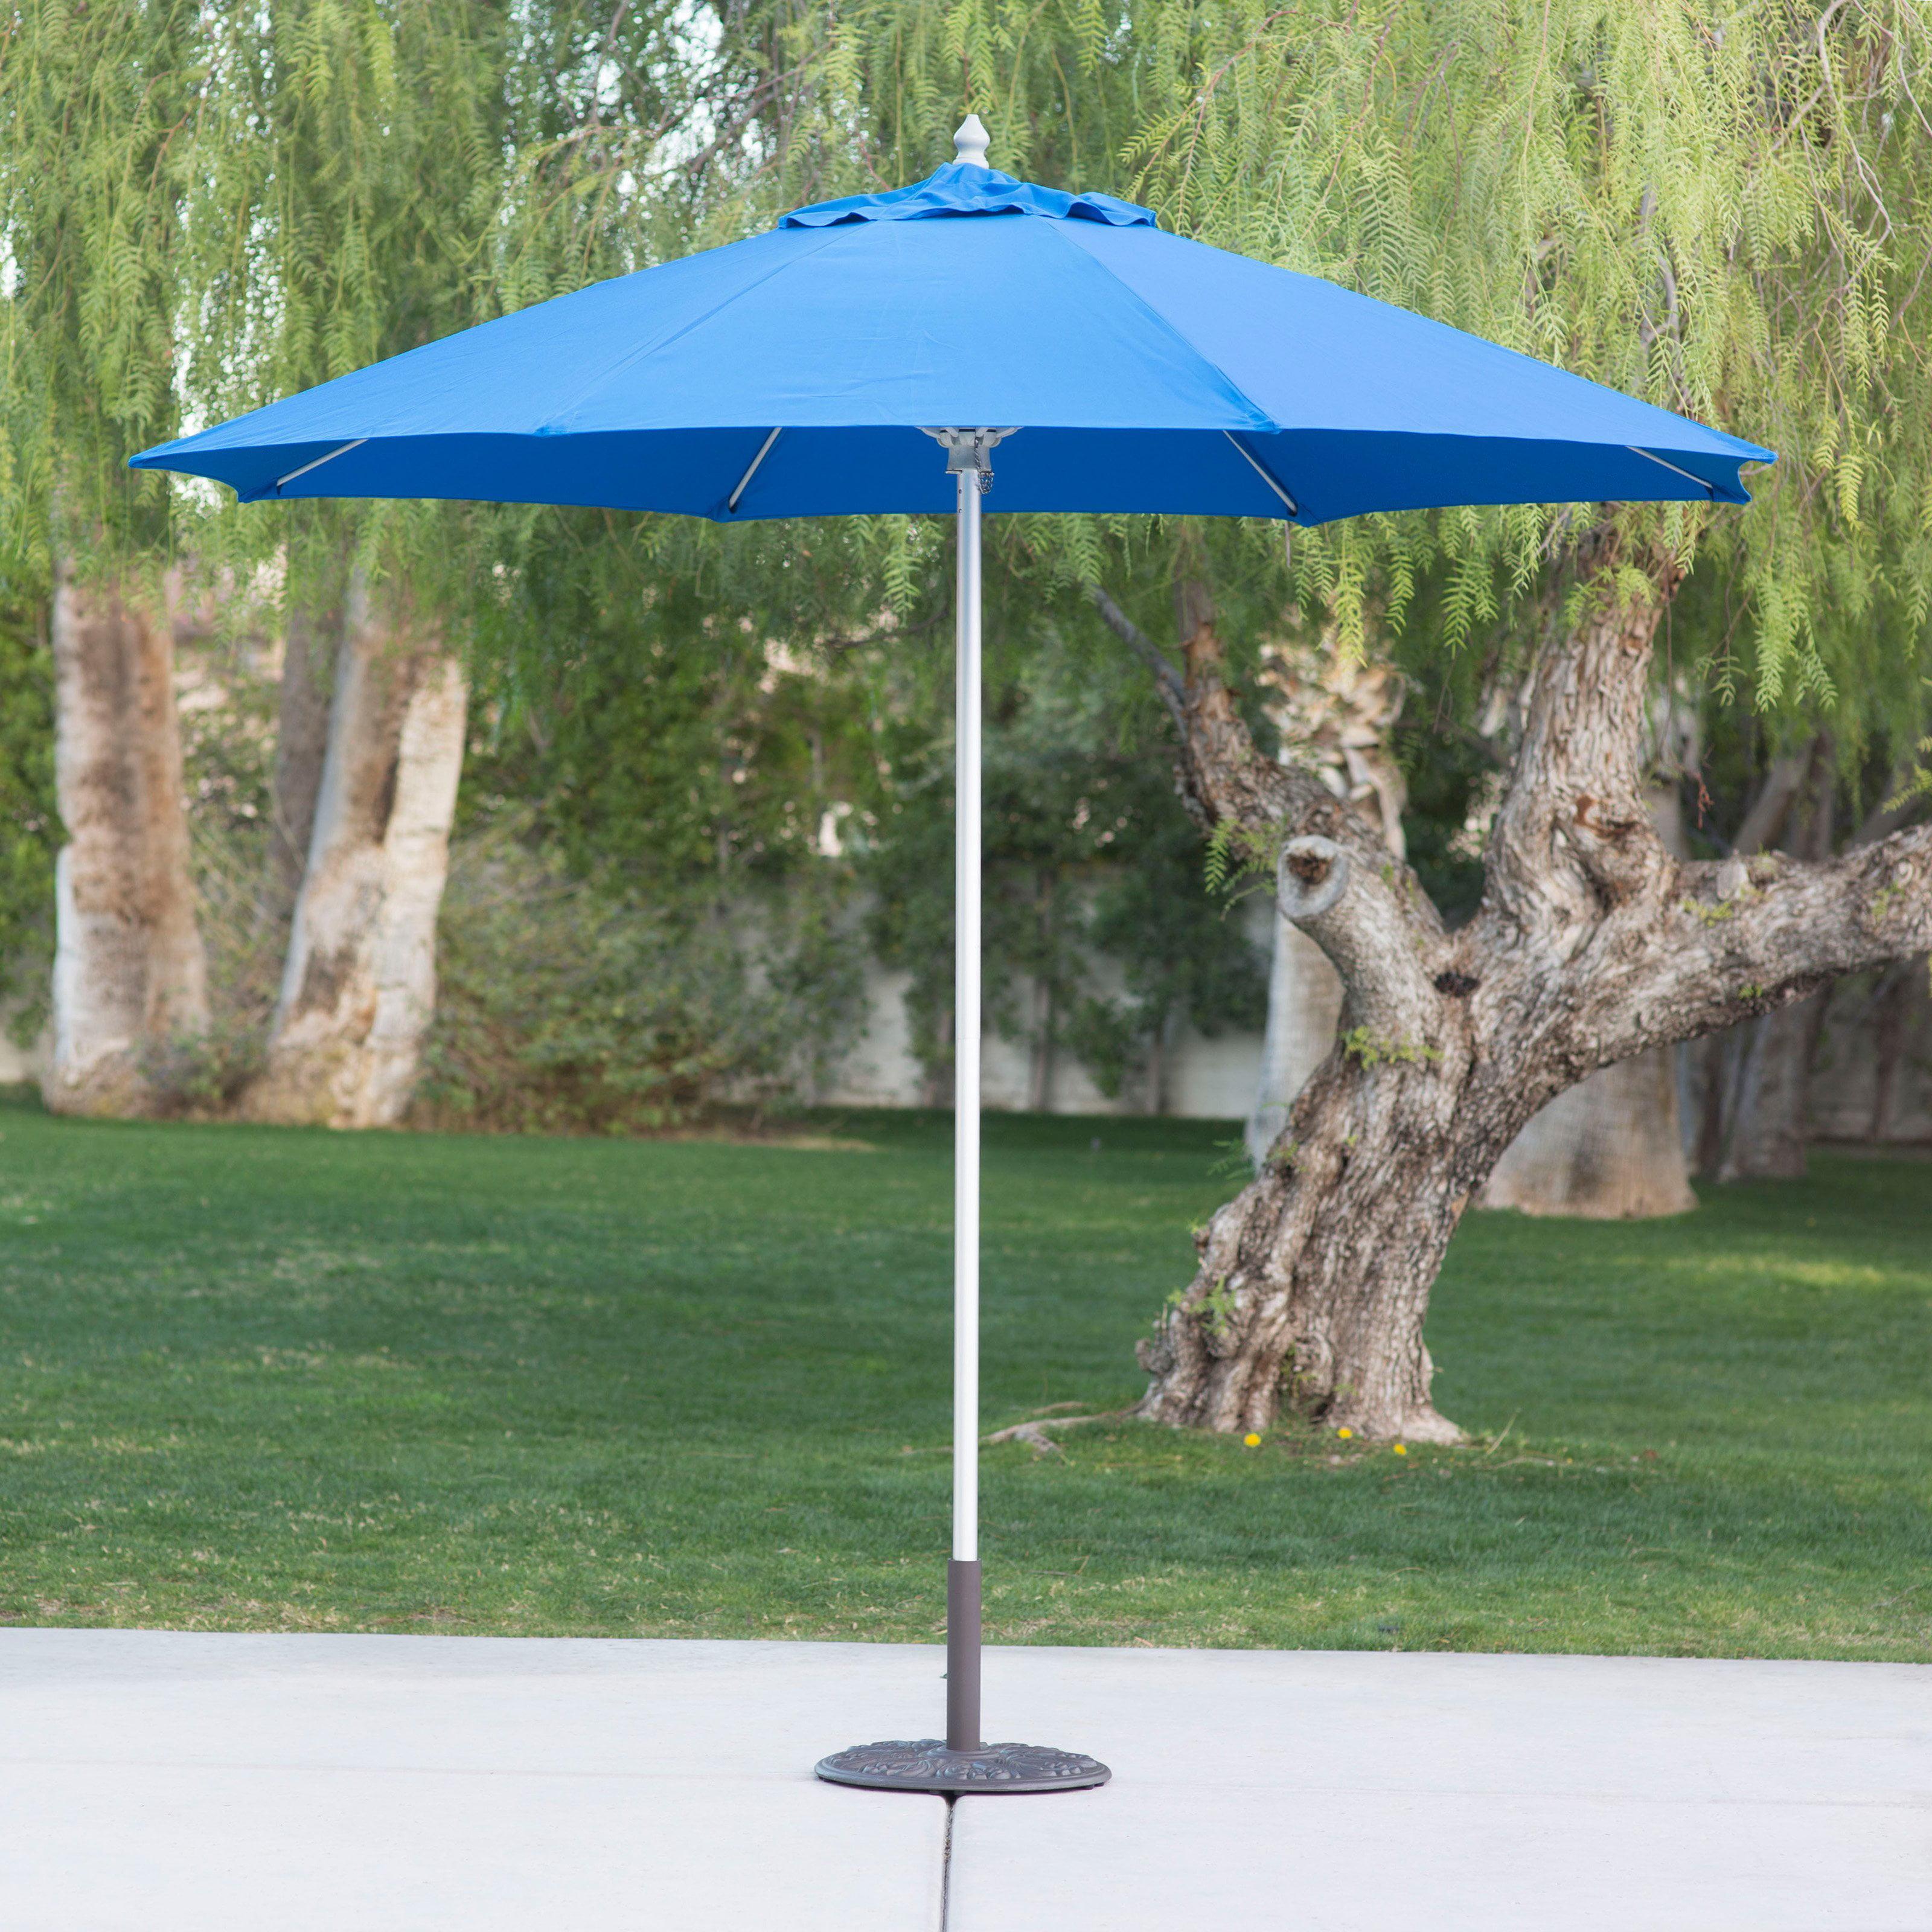 Belham Living 9 ft Sunbrella mercial Aluminum Wind Resistant